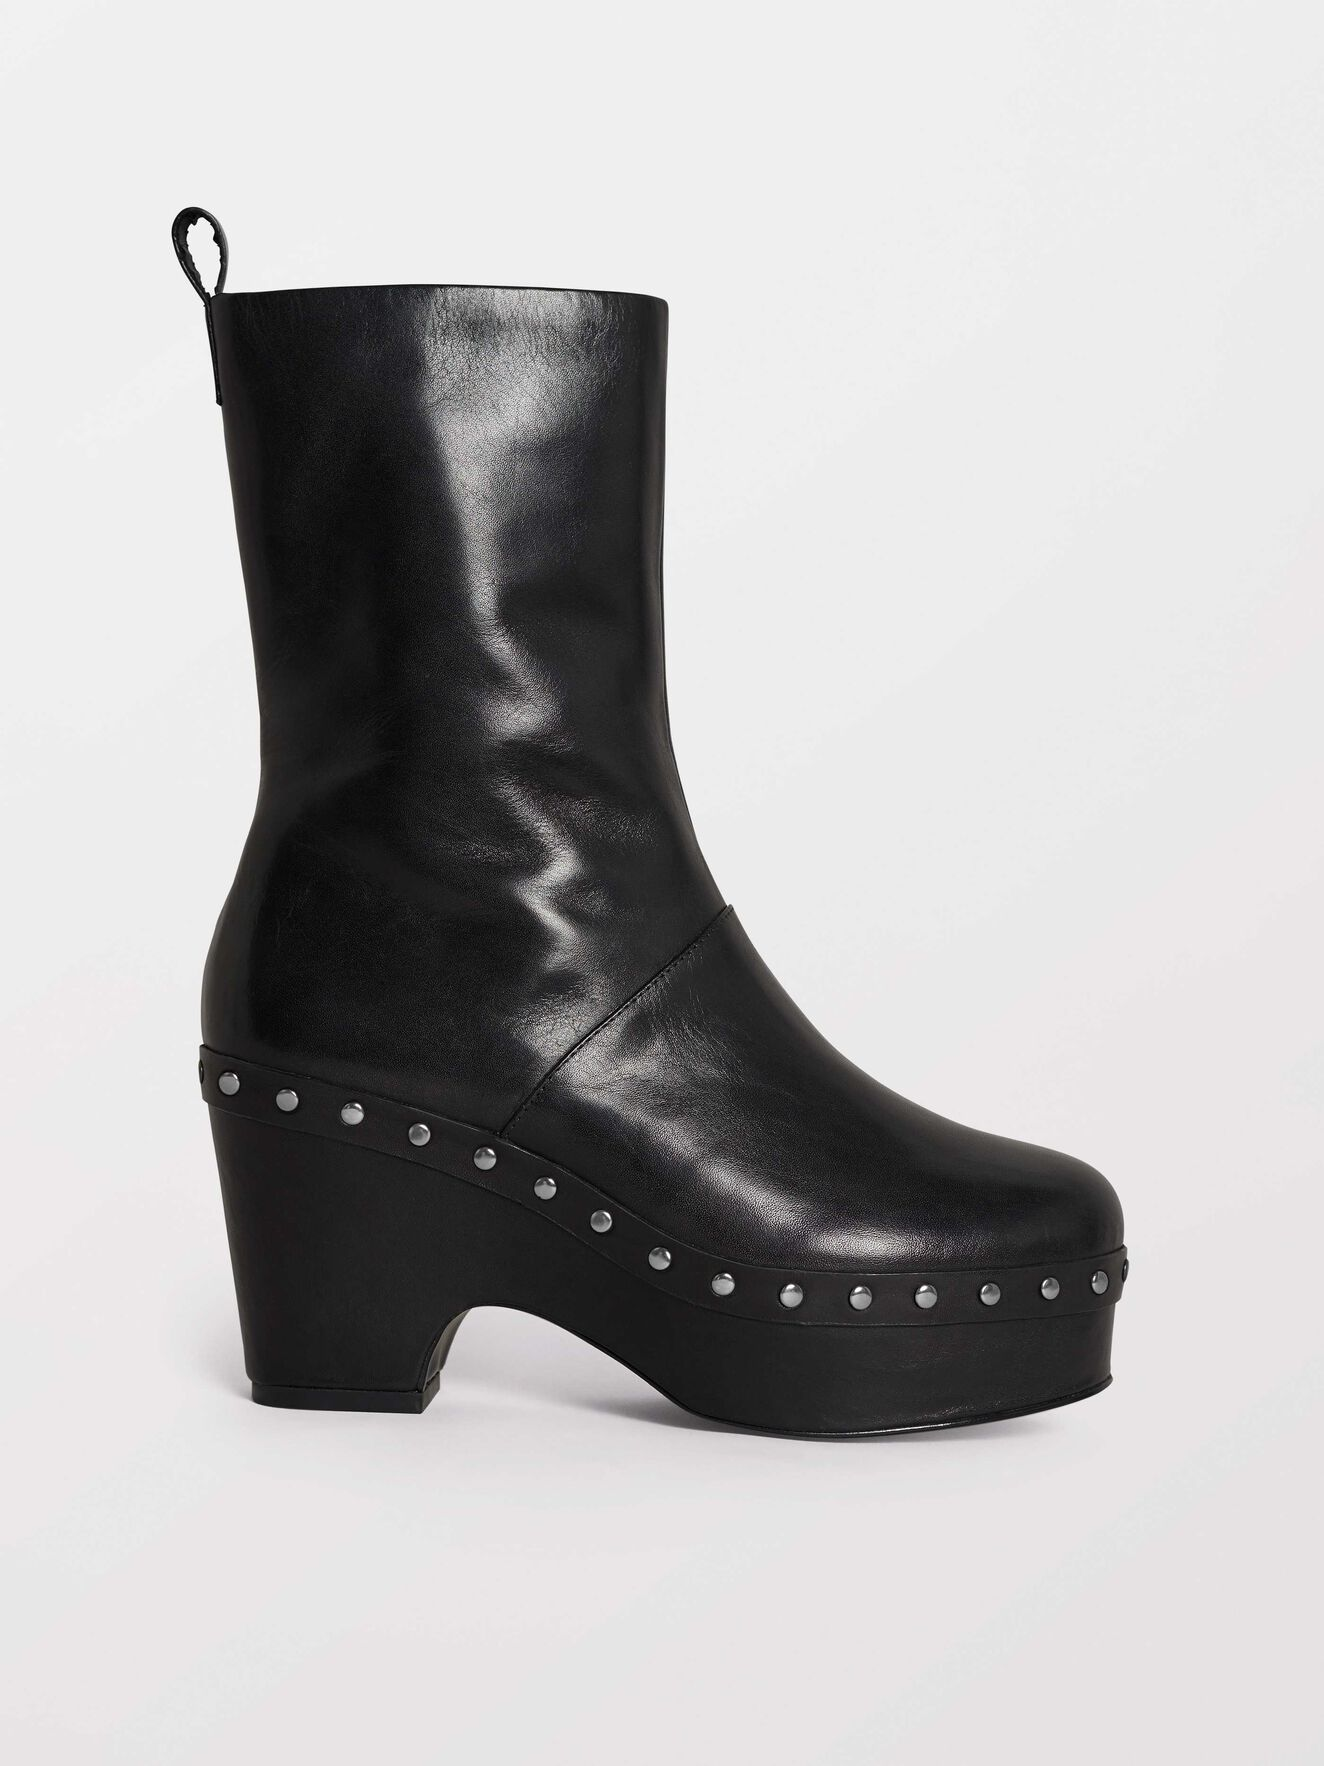 Botan Boots in Black from Tiger of Sweden